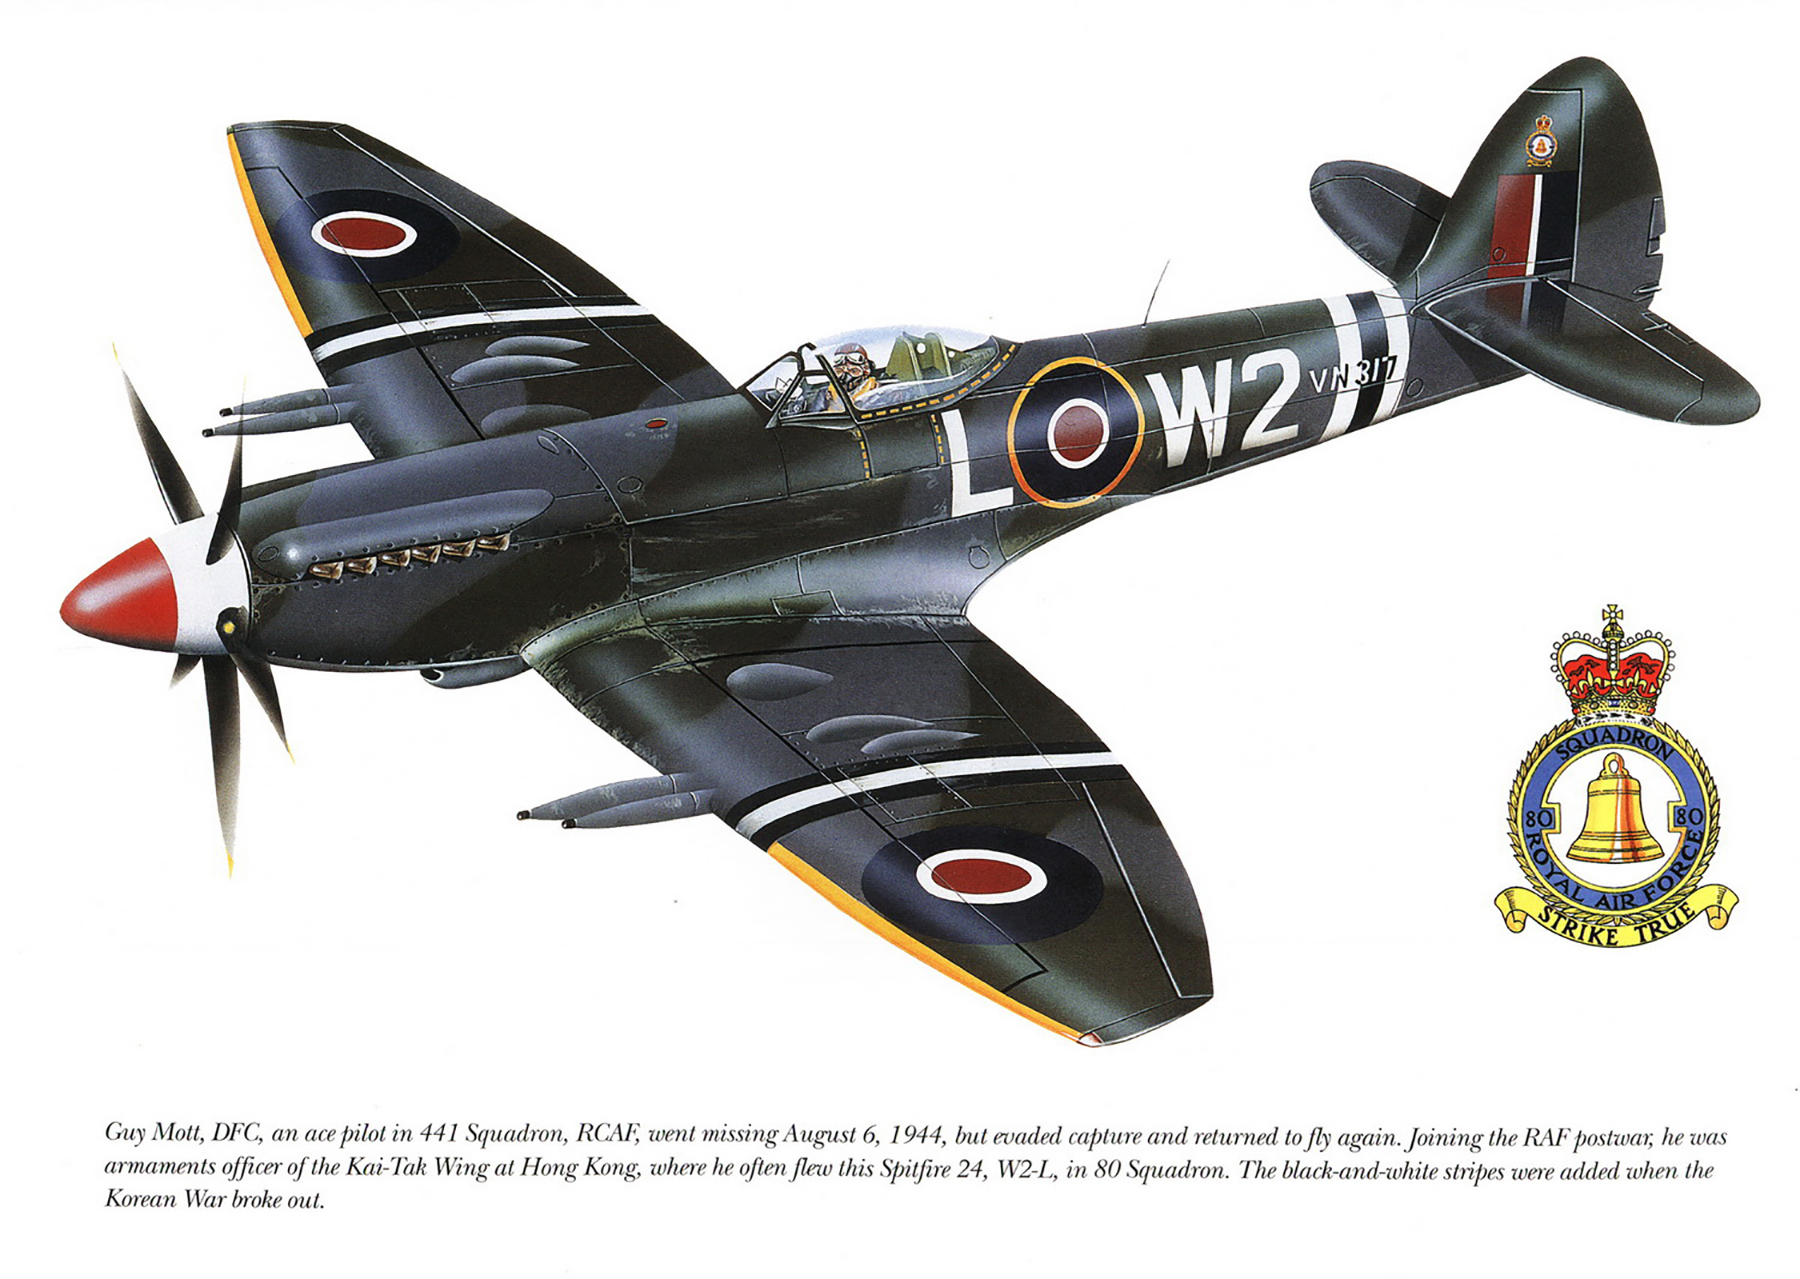 Spitfire F24 RAF 80Sqn W2P Guy Mott VN317 Kai Tak Wing Hong Kong 1947 0A